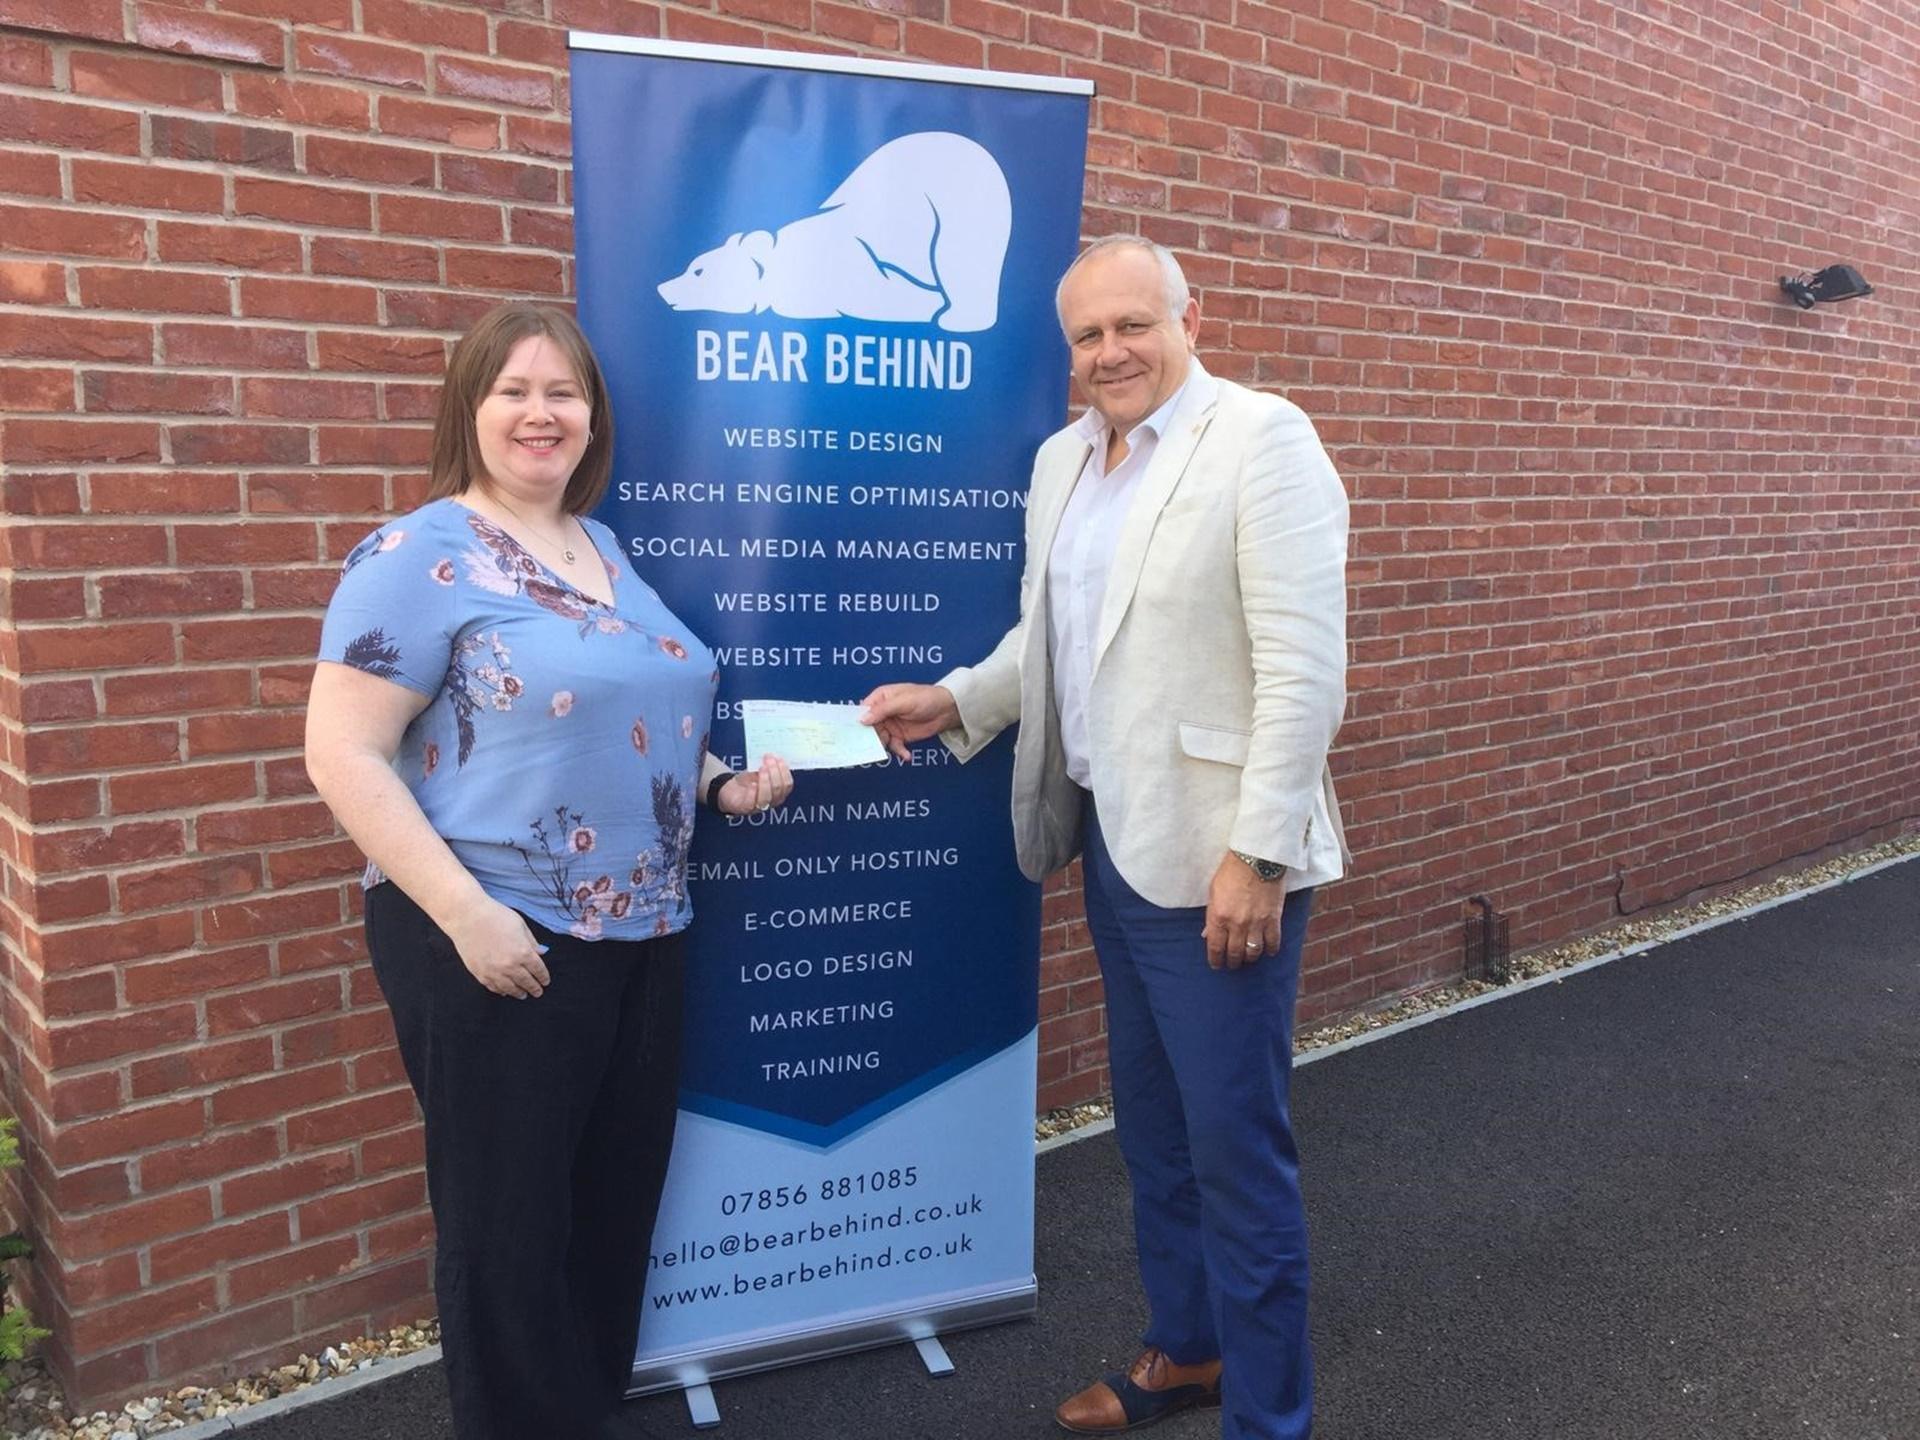 Councillor Matthews presents cheque to Katie Brook